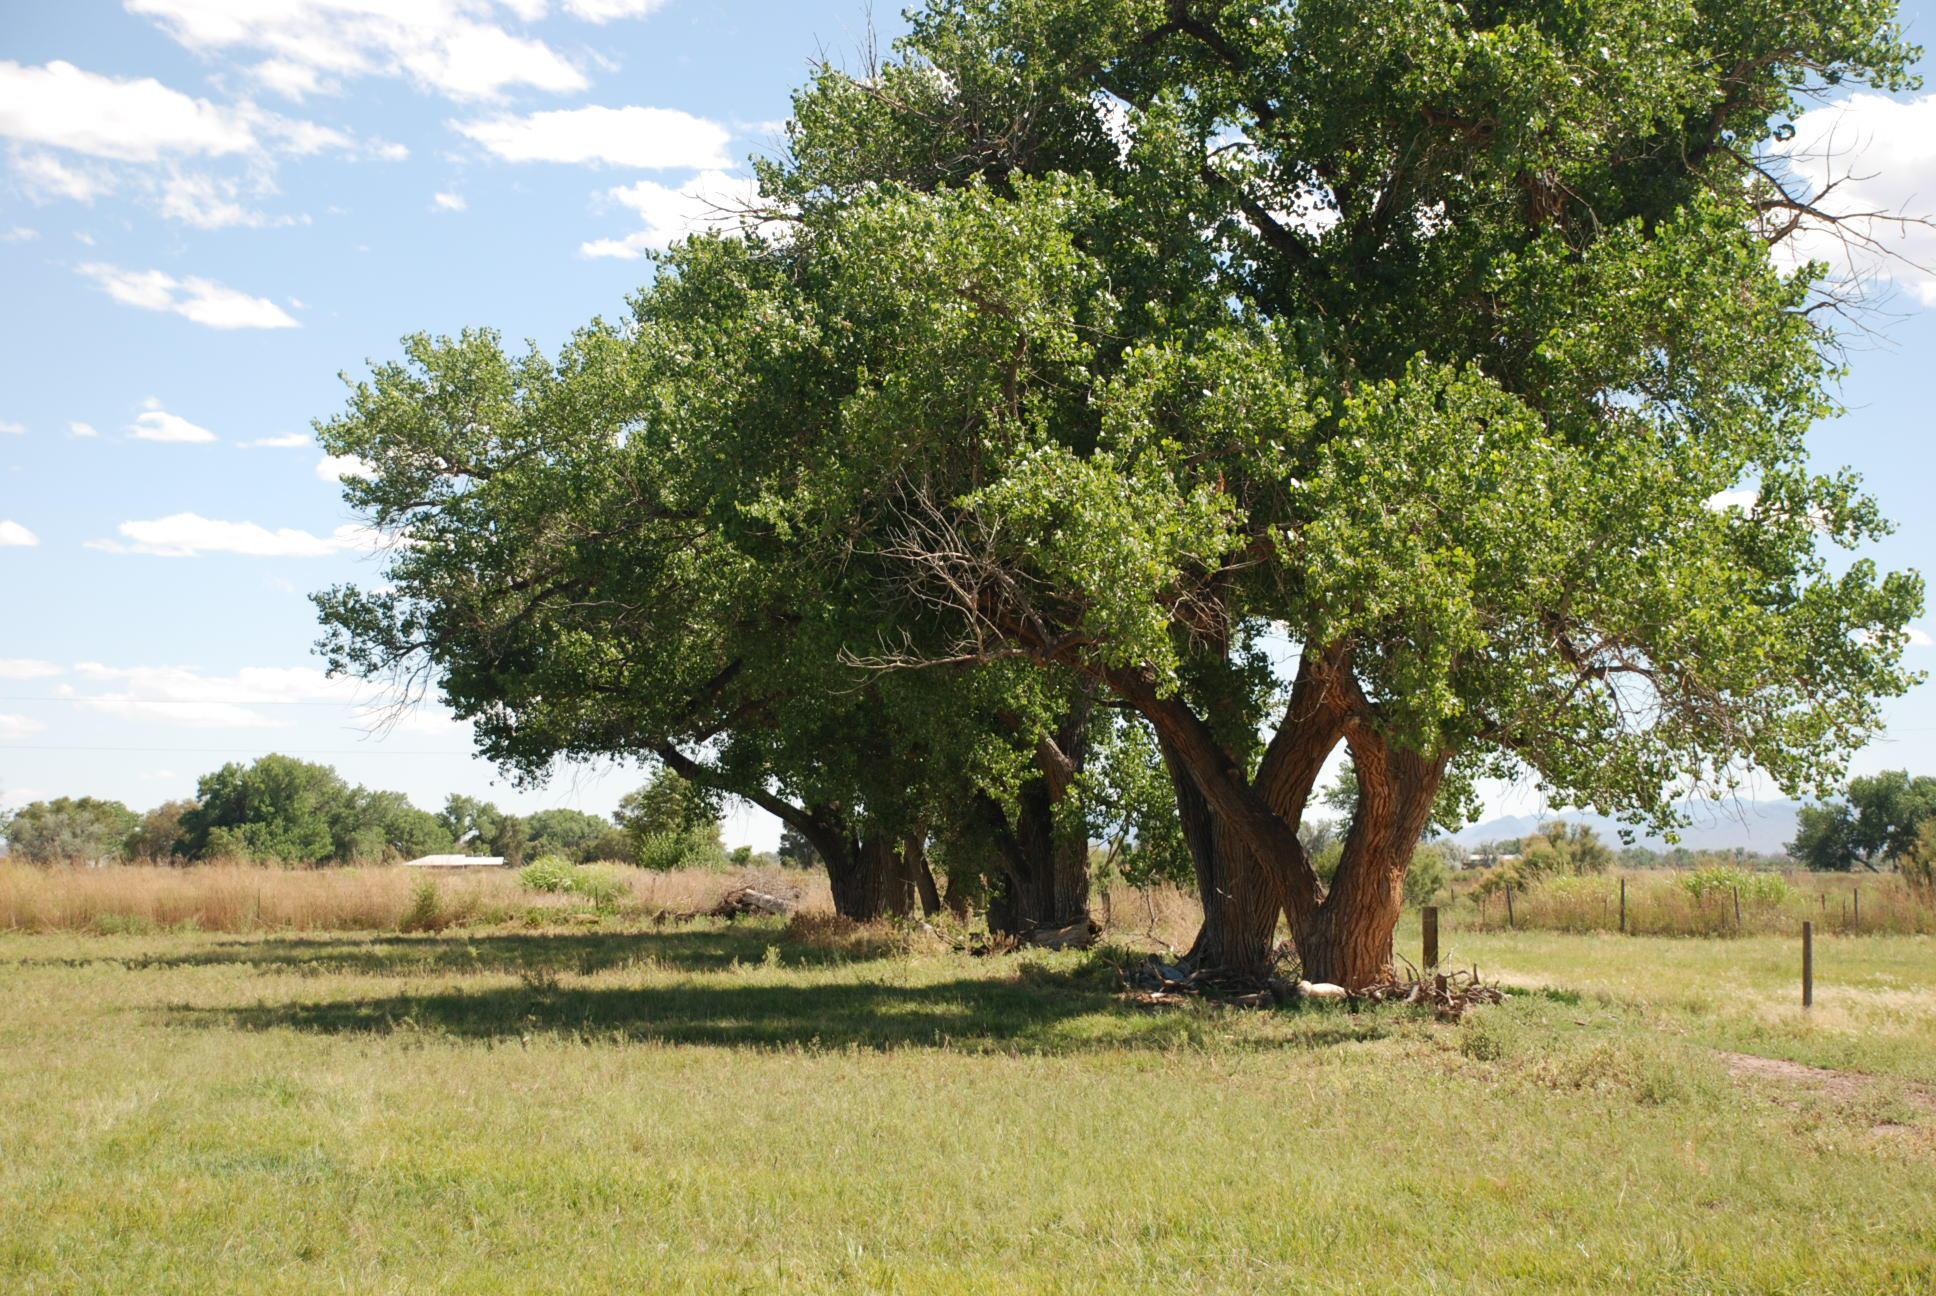 000 Camino Ulibarri Property Photo - Veguita, NM real estate listing